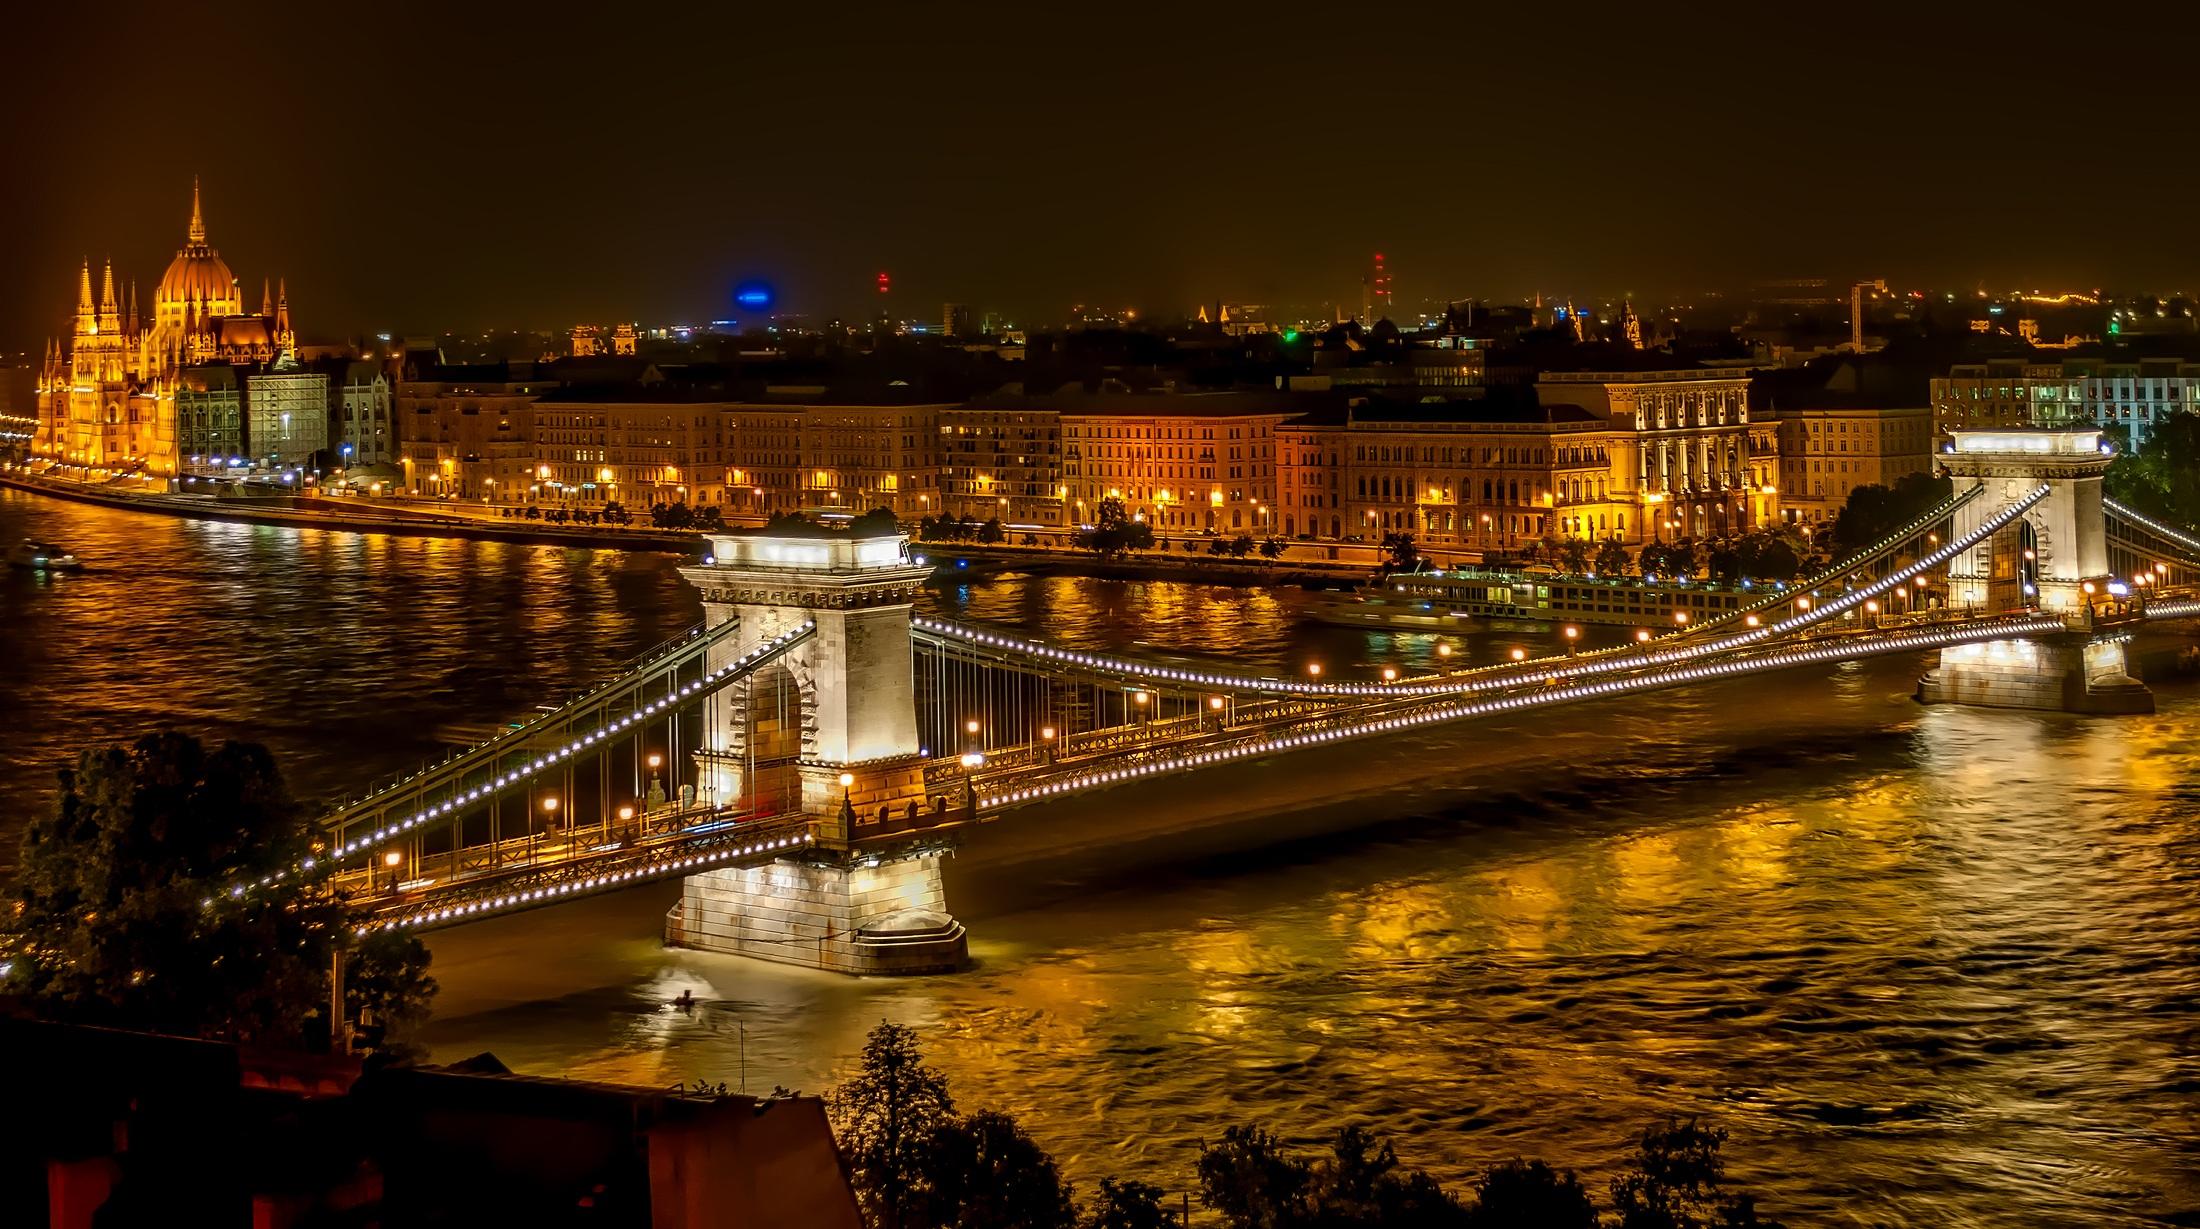 Szechenyi chain bridge photo